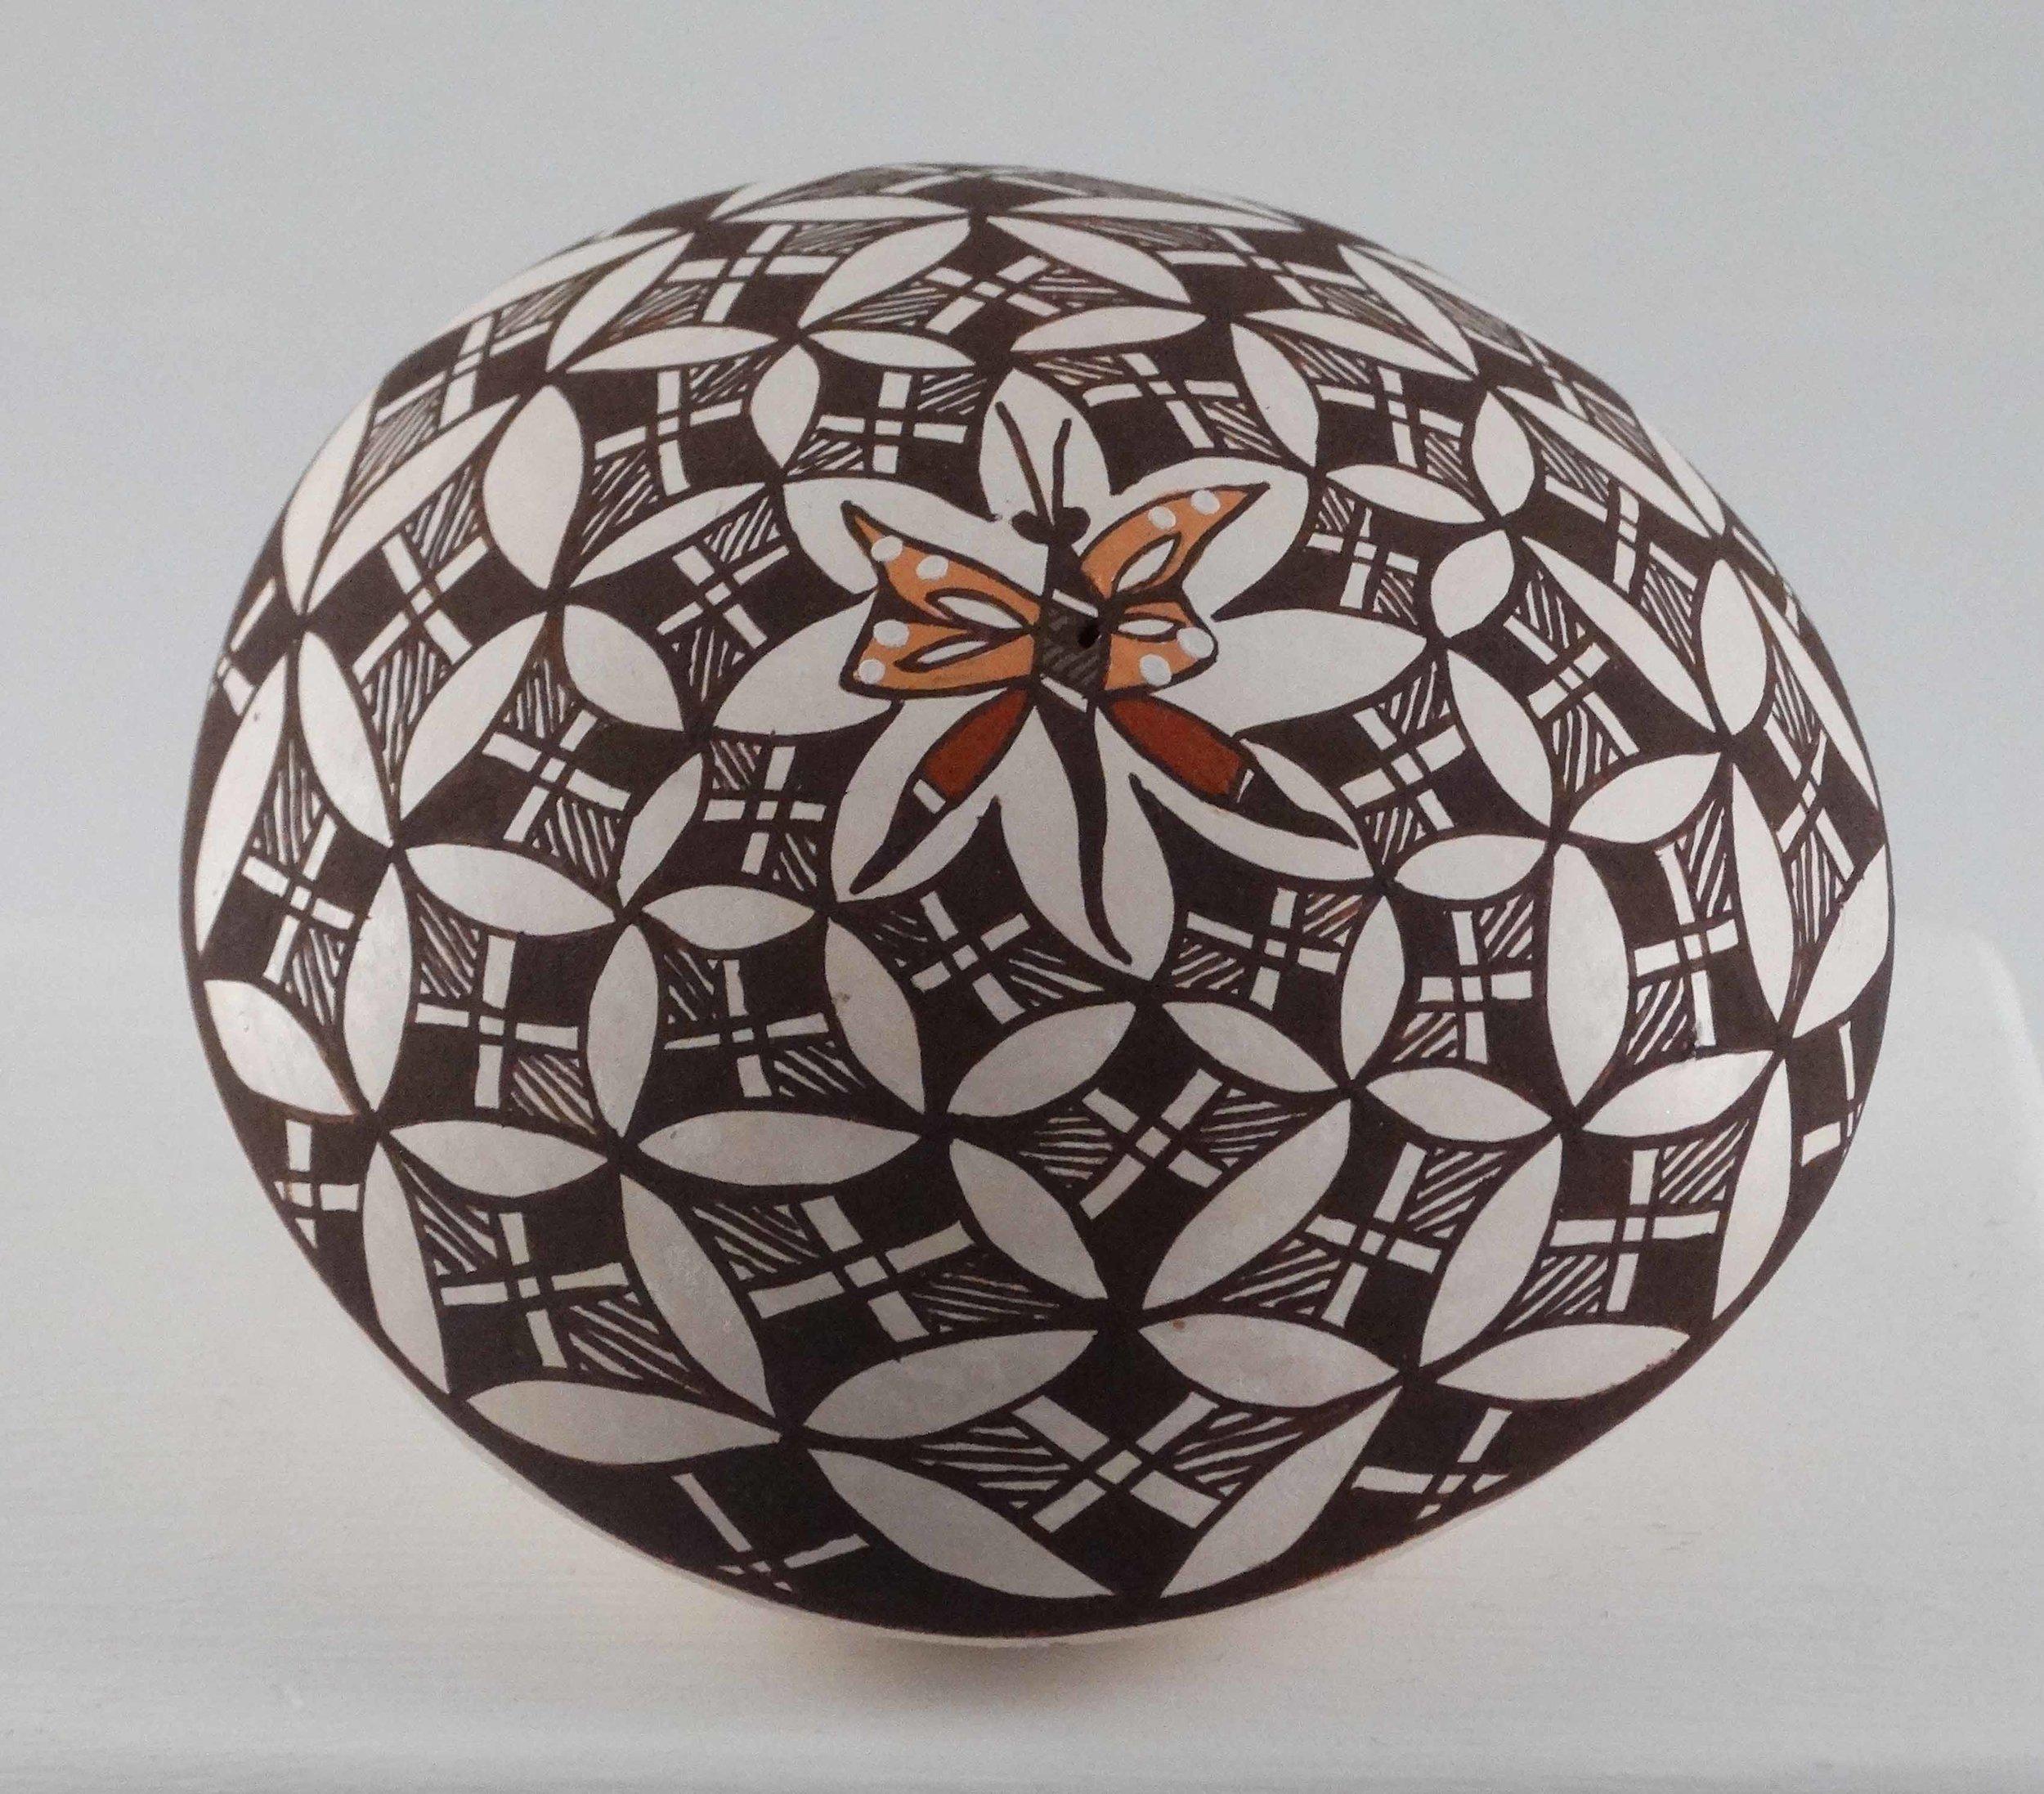 Polychrome Seed Jar by Diane Lewis-Garcia (click to enlarge)